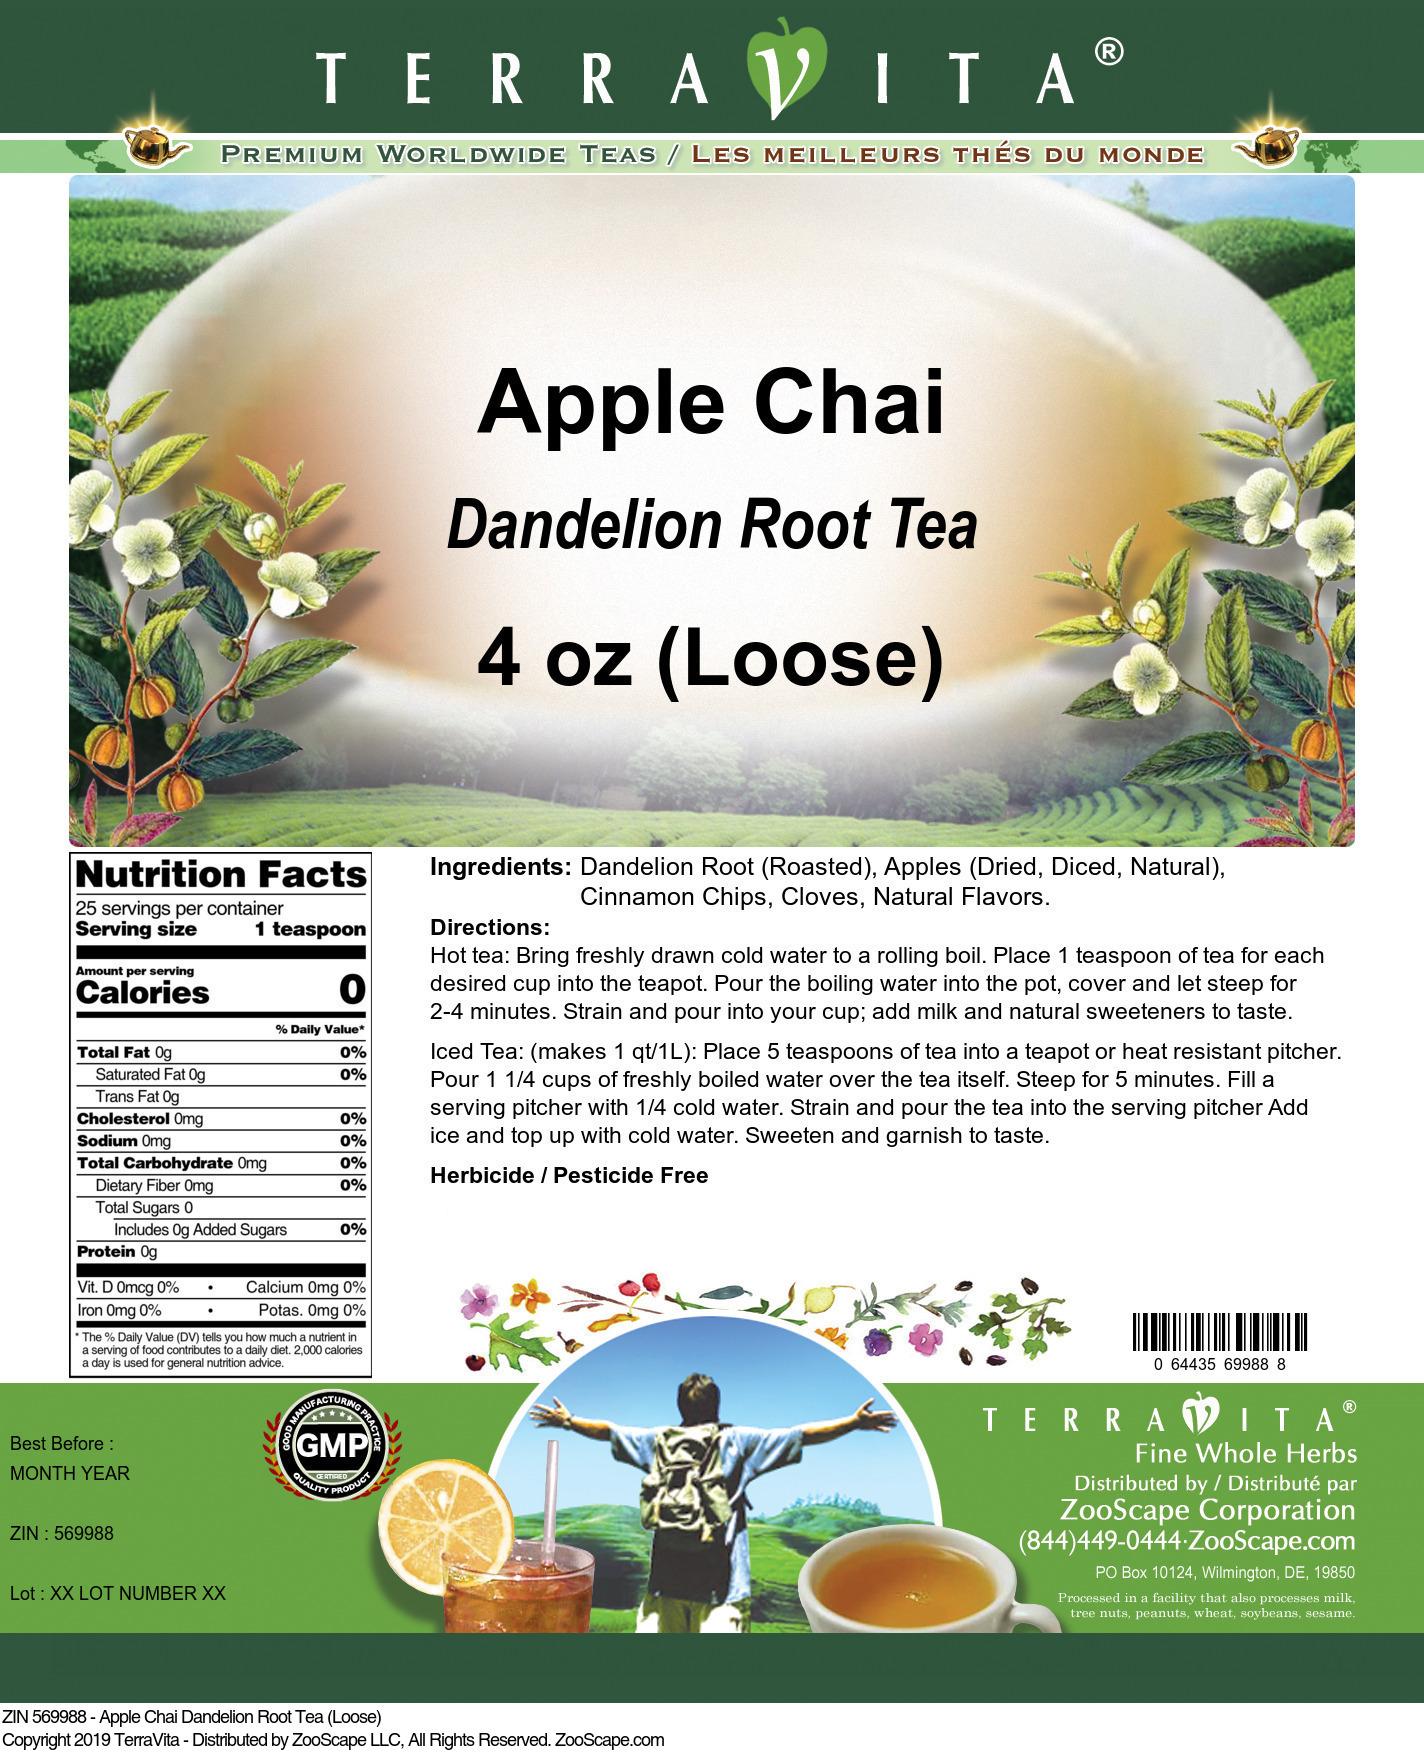 Apple Chai Dandelion Root